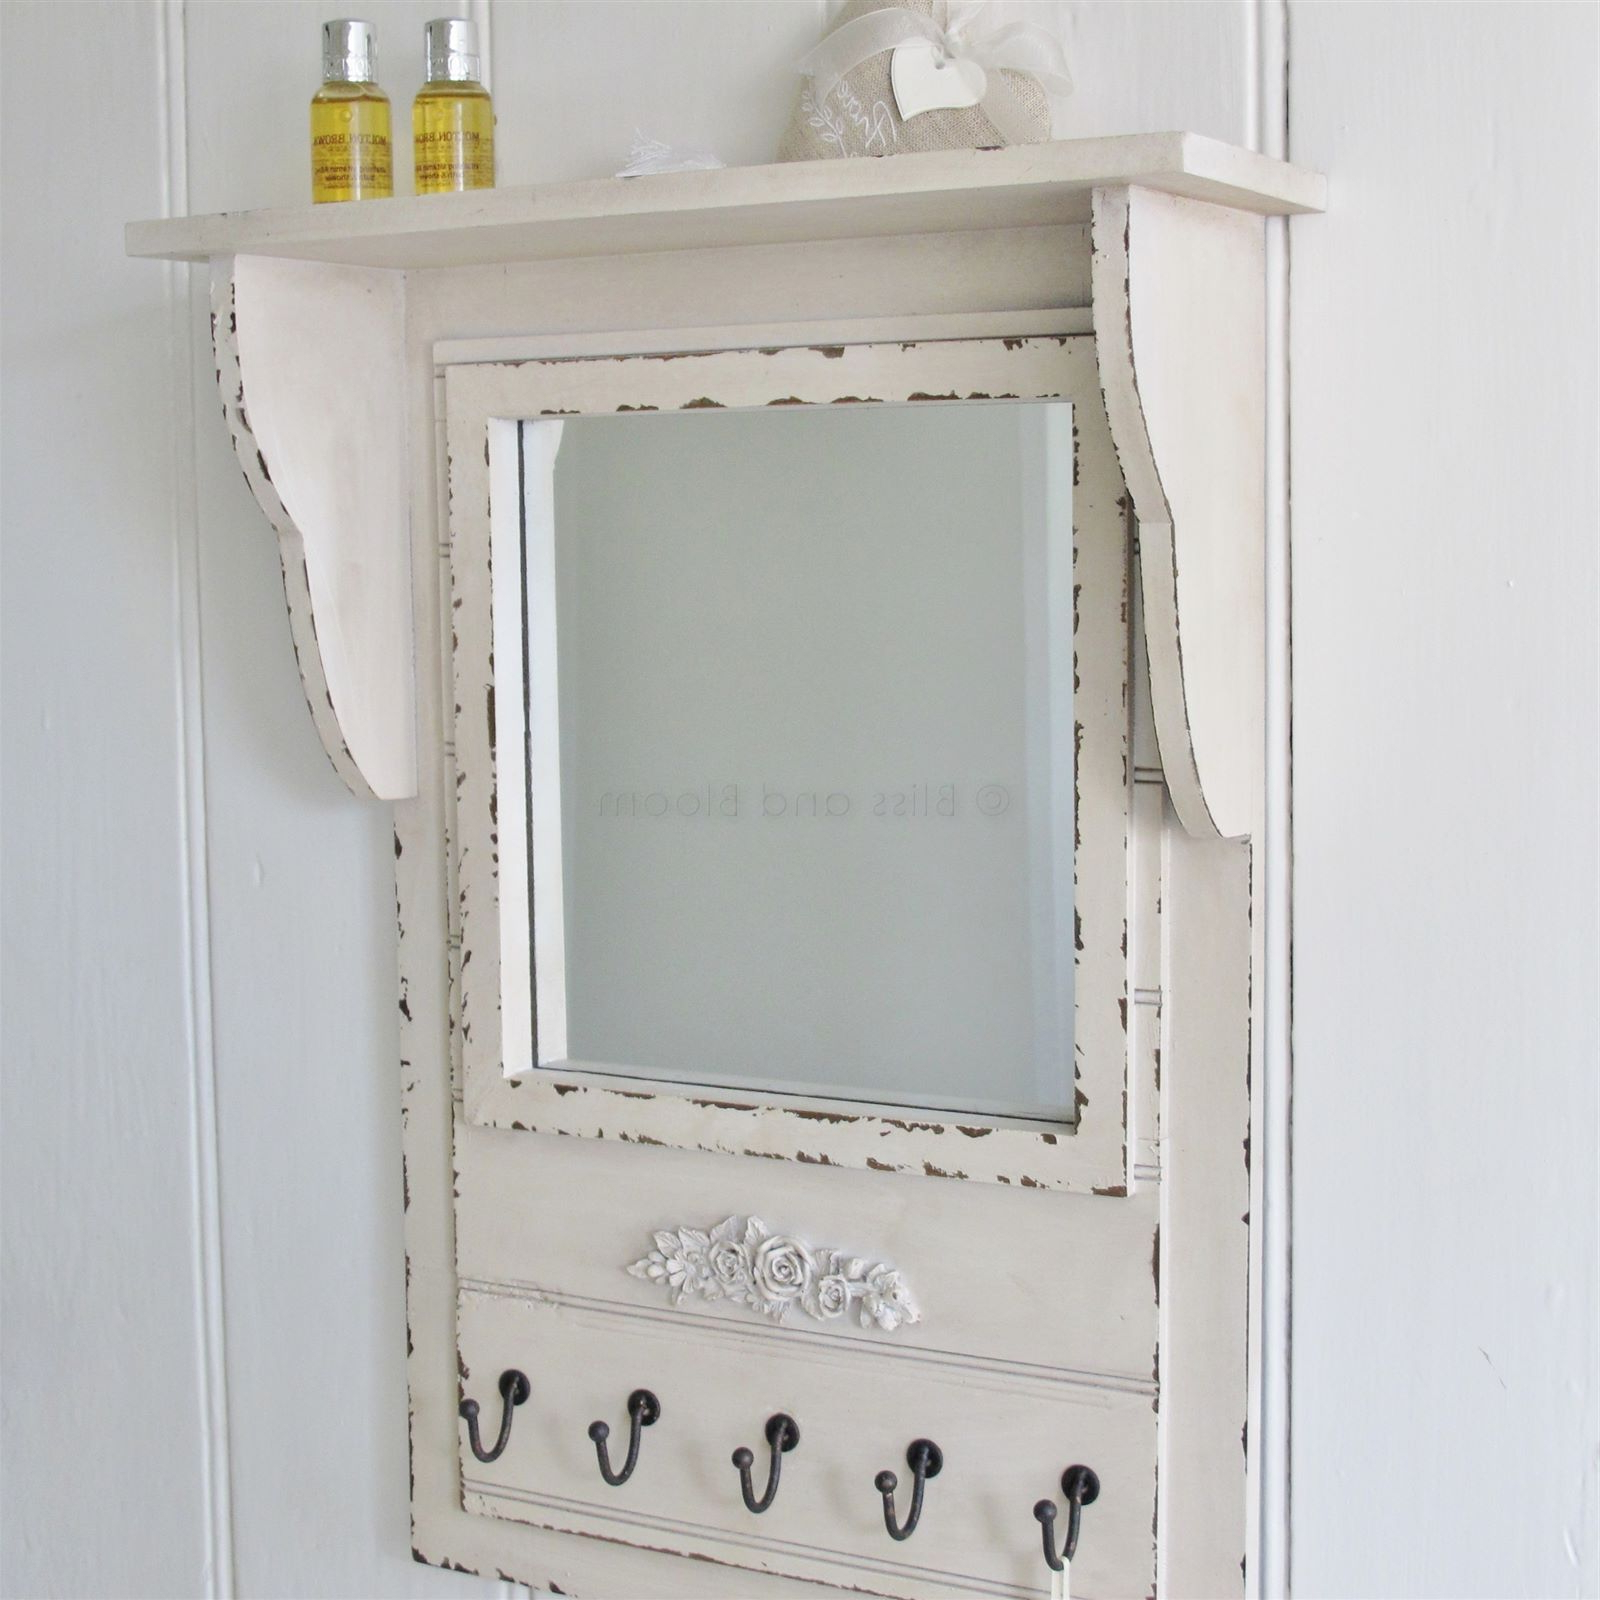 Wall Mirror Shelf Hooks (View 14 of 20)